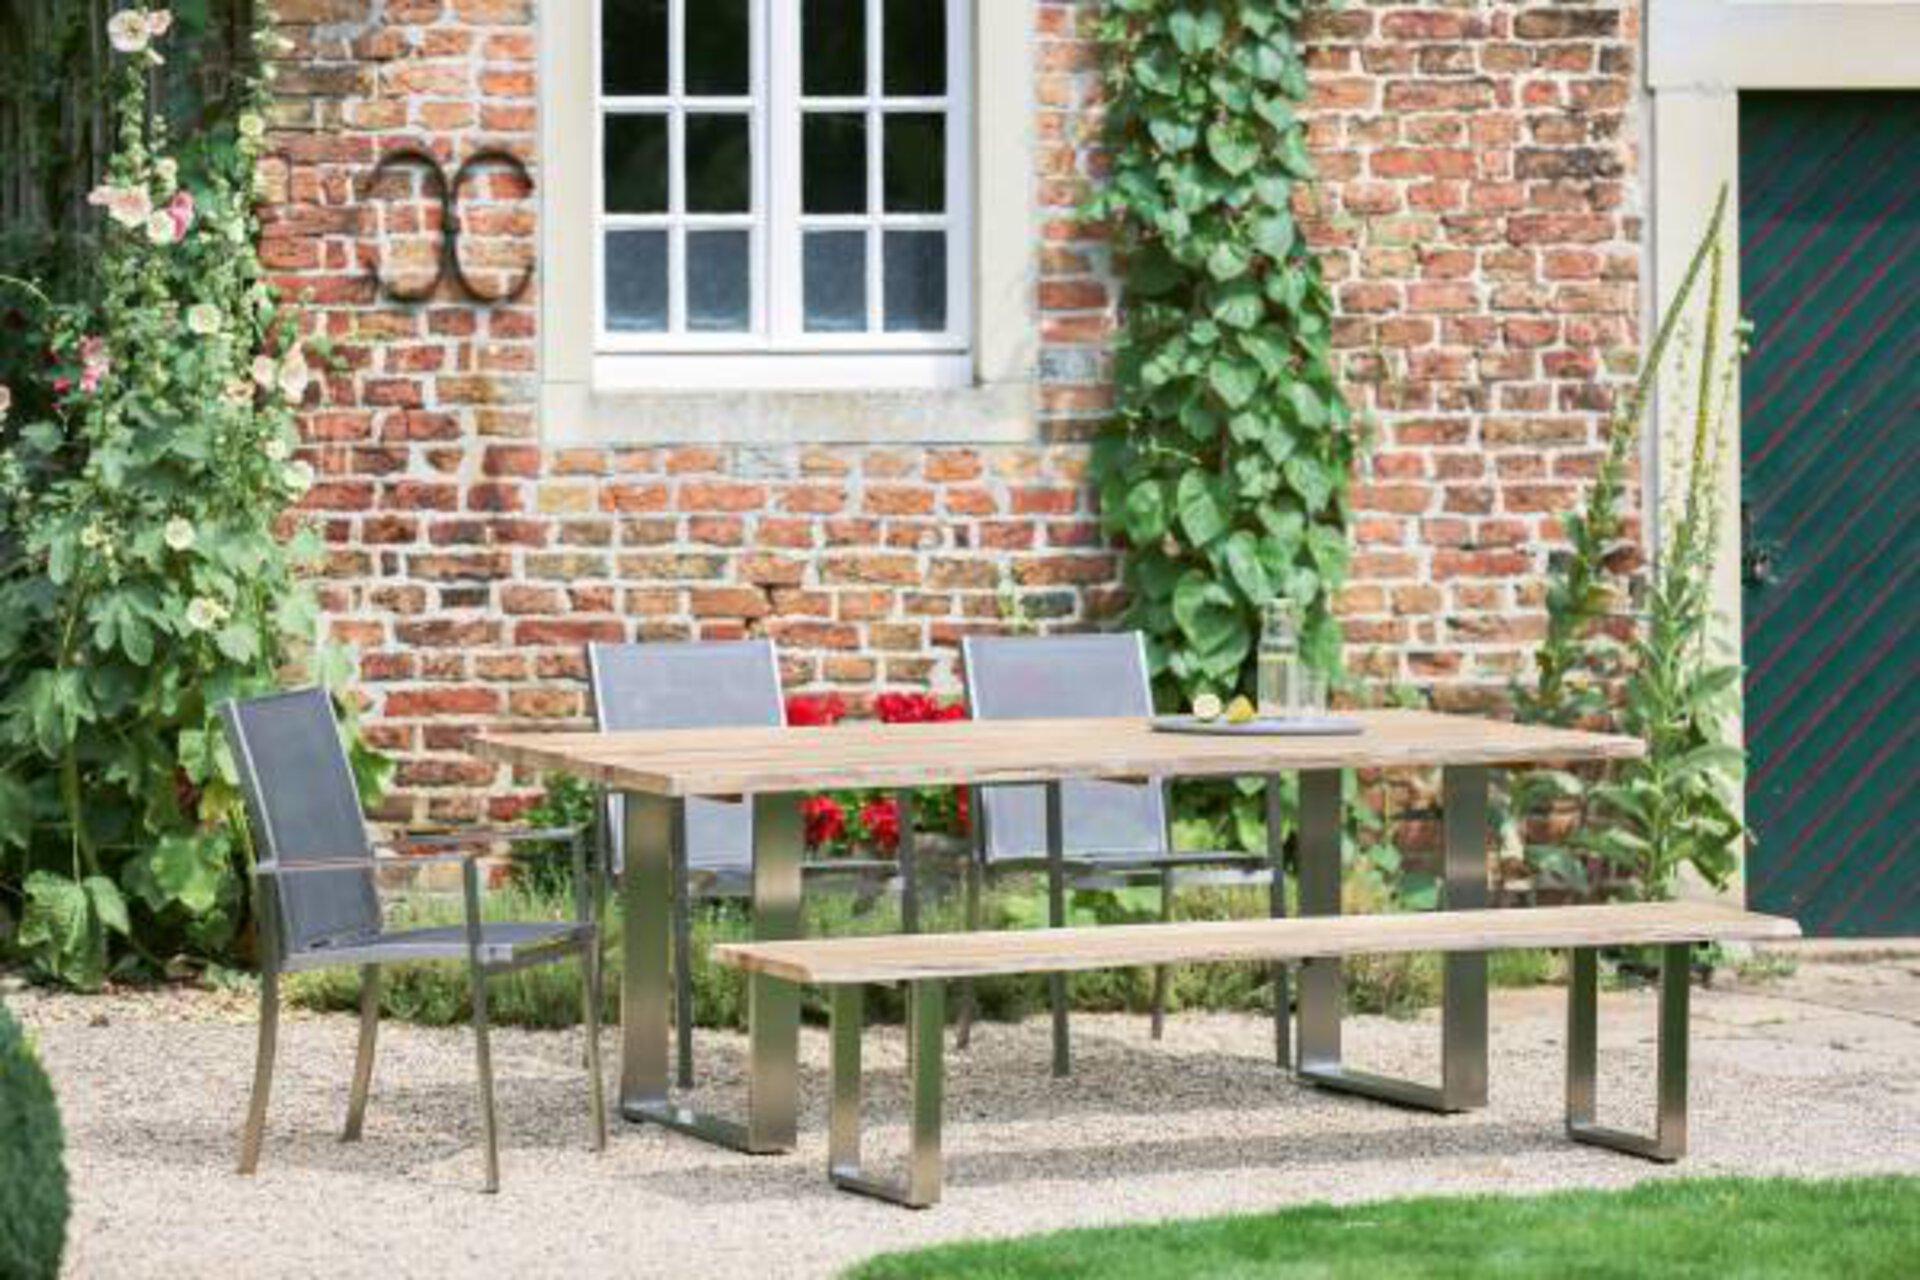 Gartenbank SOLID Niehoff Contract GmbH Garden Holz braun 46 x 40 x 220 cm